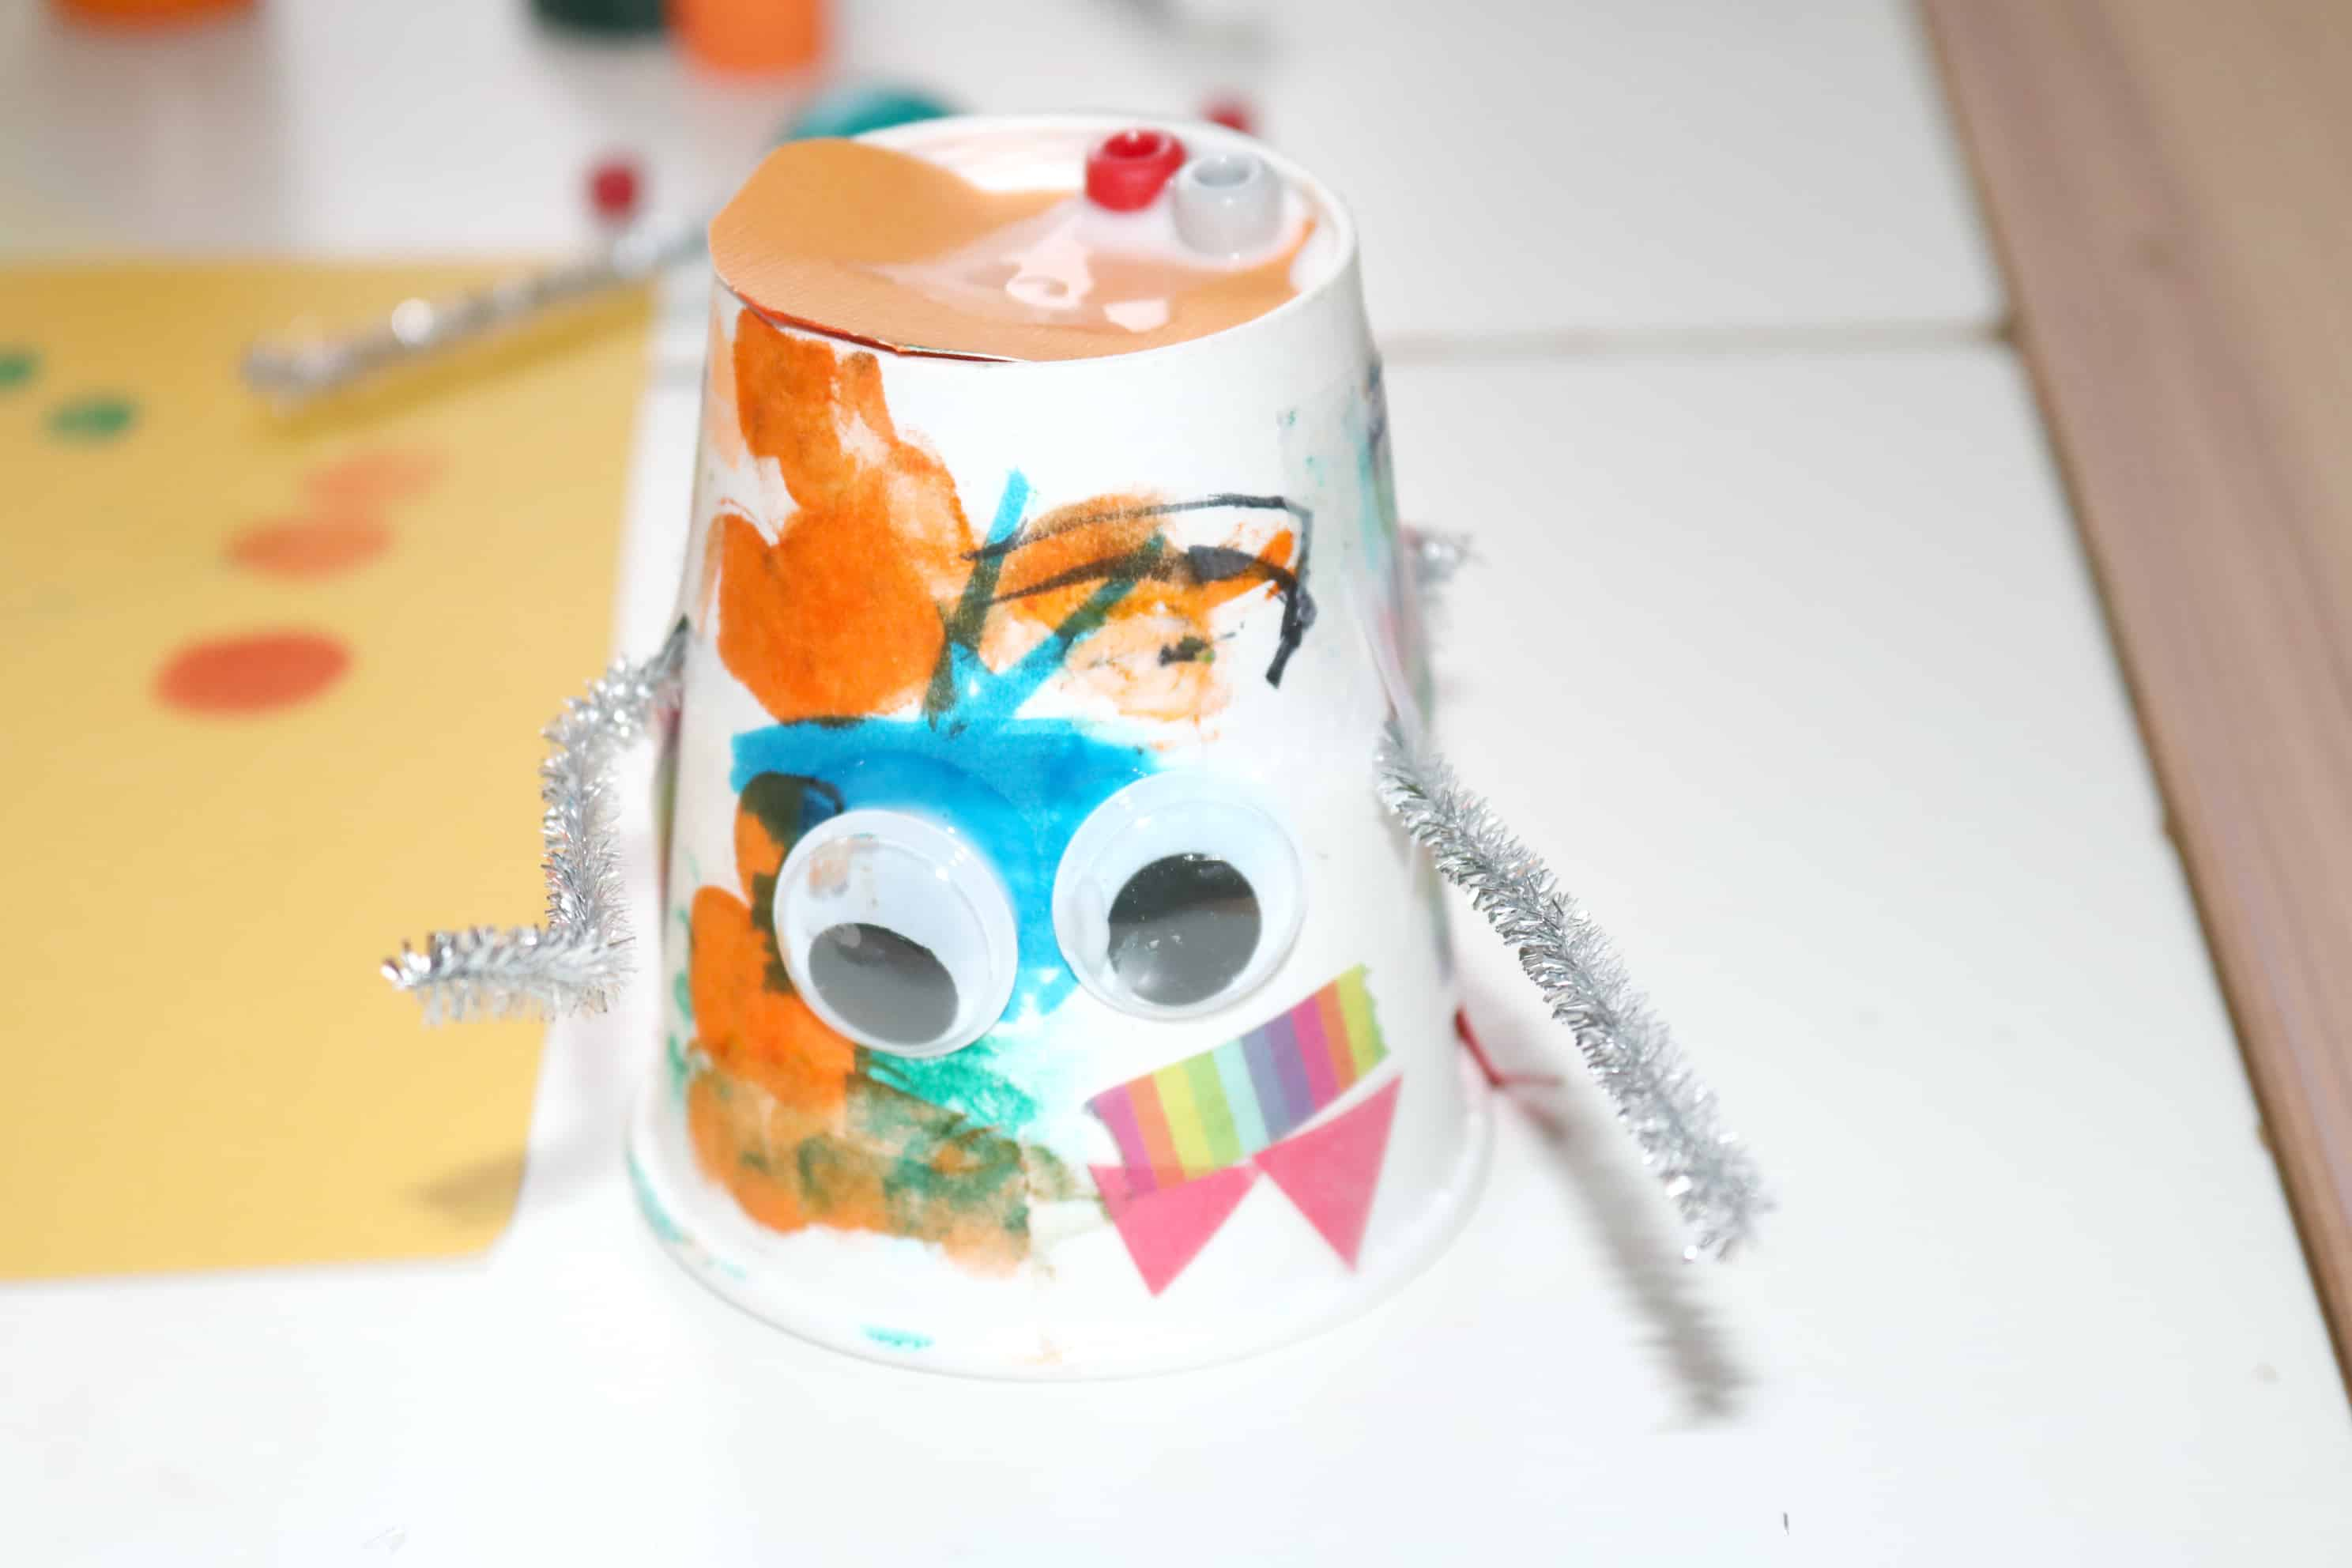 Robot Tinkering Process Art for Little Kids